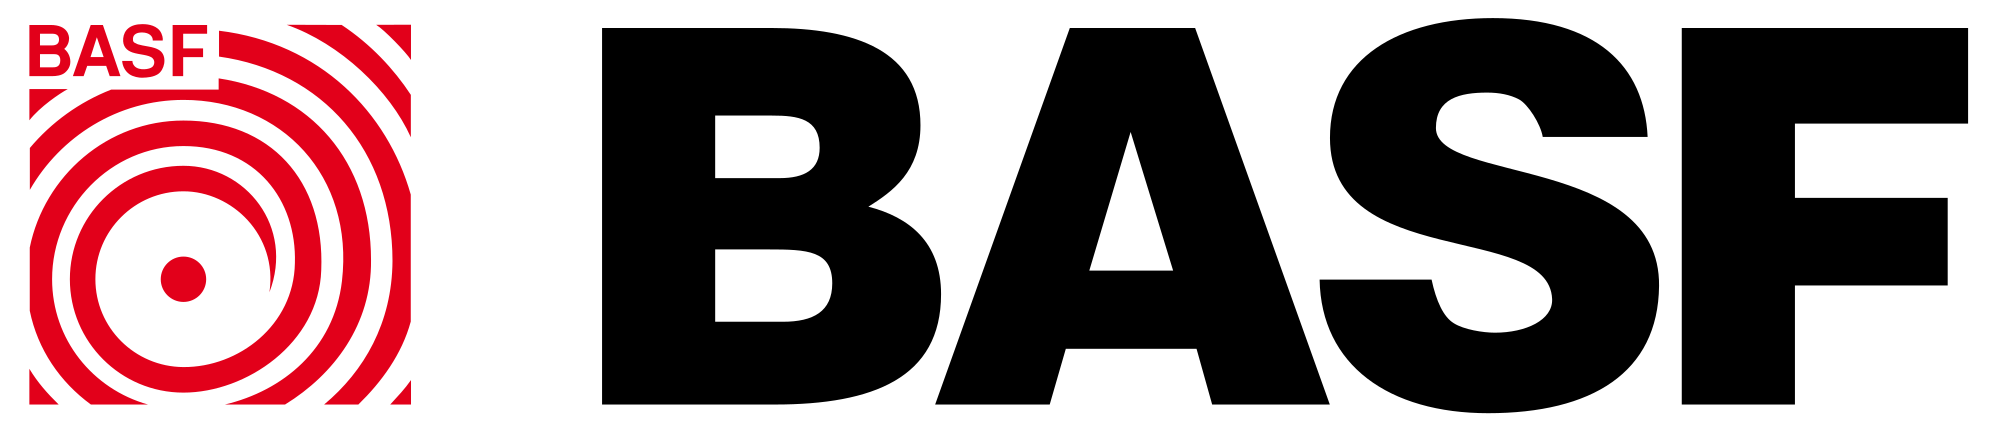 Basf logo clipart clip art royalty free stock Basf Logos clip art royalty free stock